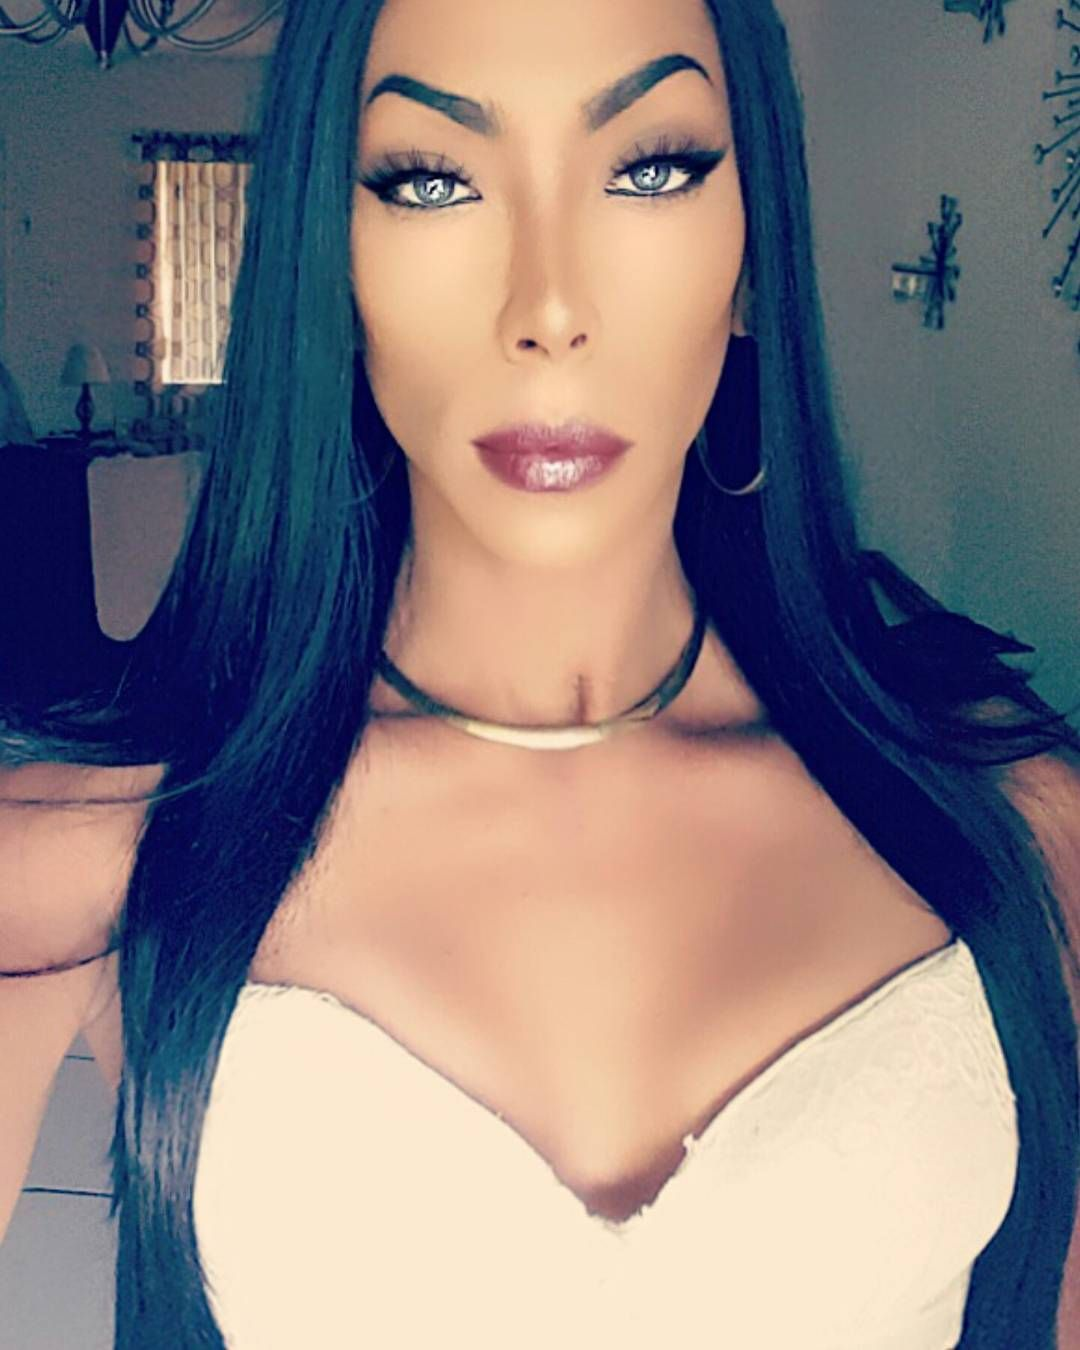 26 Me Gusta 4 Comentarios Lexi Cruz Lexi_cruz82 En Instagram Lookin Good Feeling Gorgeous Sexy Tg Ts Trans Transgender Tgirl Sexytrans M2f